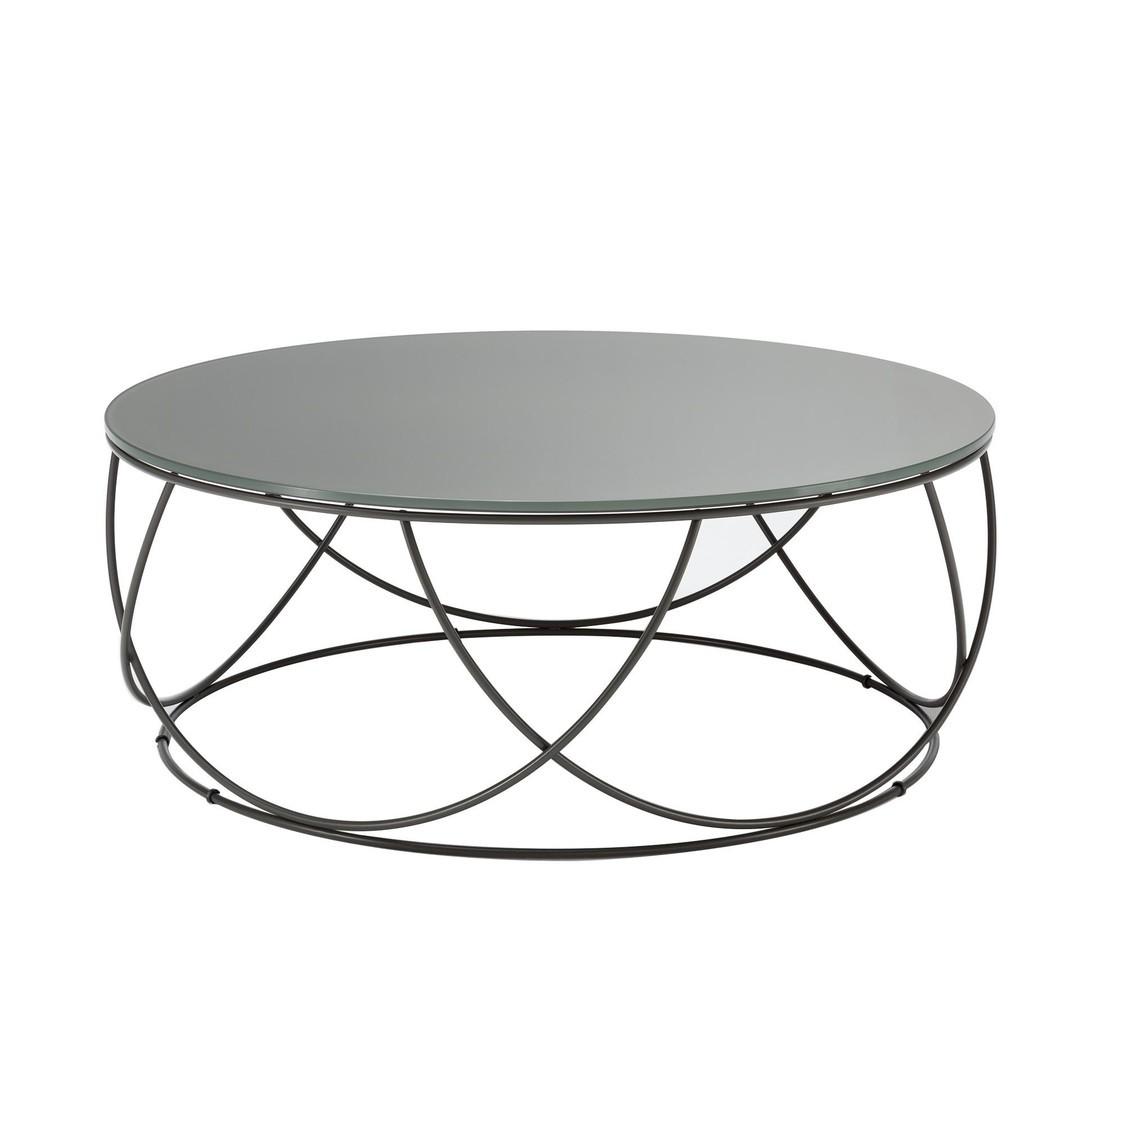 rolf benz 8770 couchtisch 80cm ambientedirect. Black Bedroom Furniture Sets. Home Design Ideas